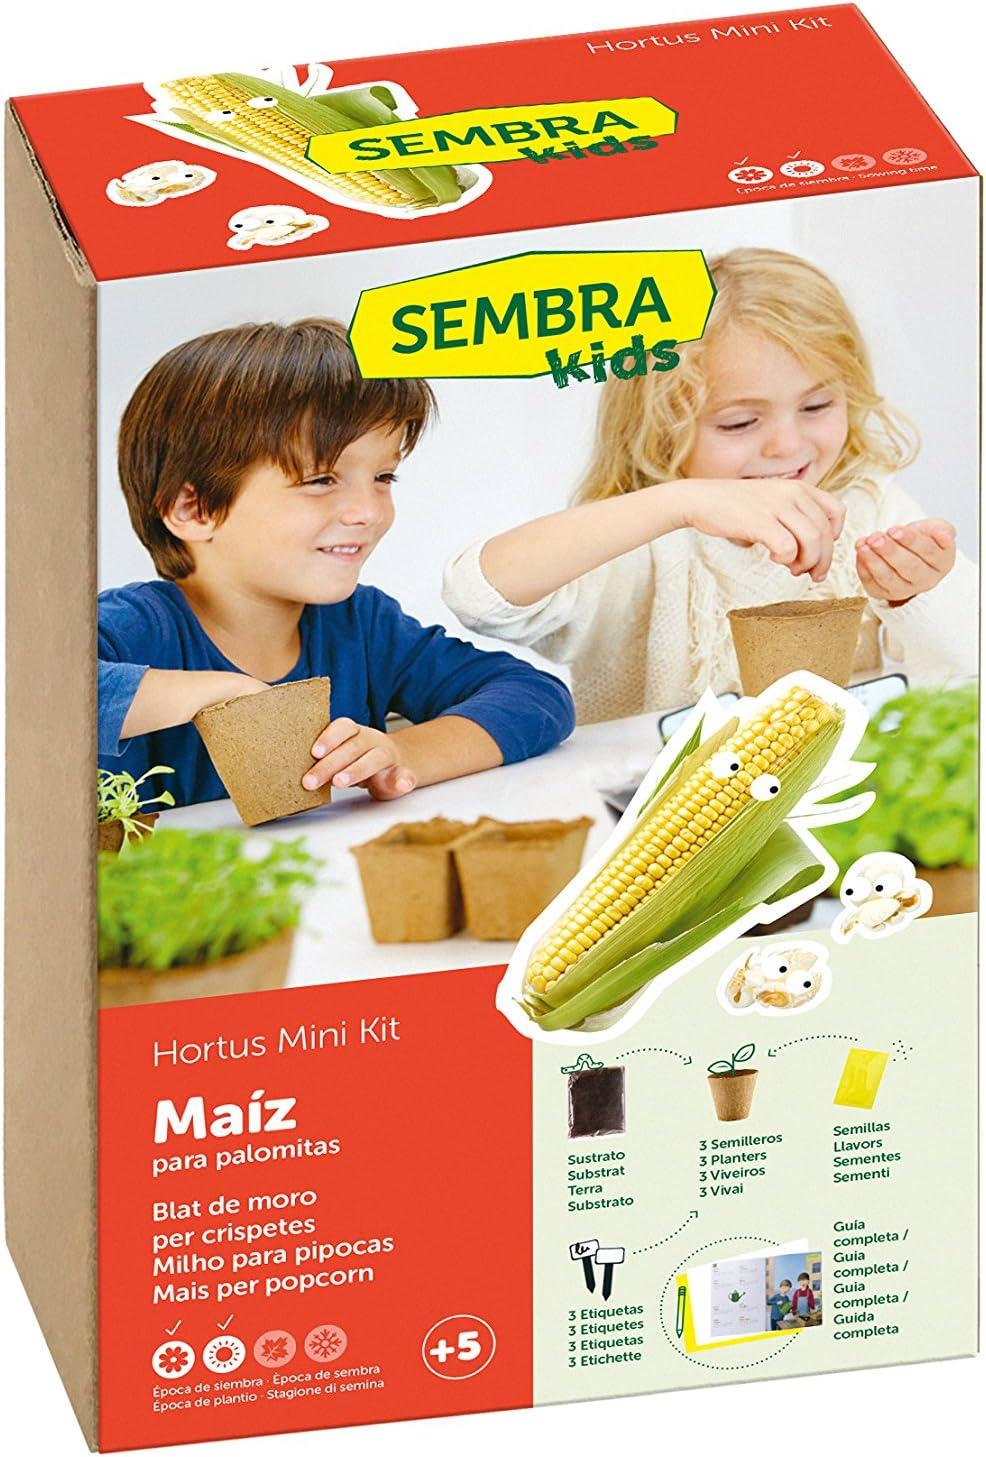 SEMBRA - juego educativo, Kit huerto Fresón: Amazon.es: Jardín